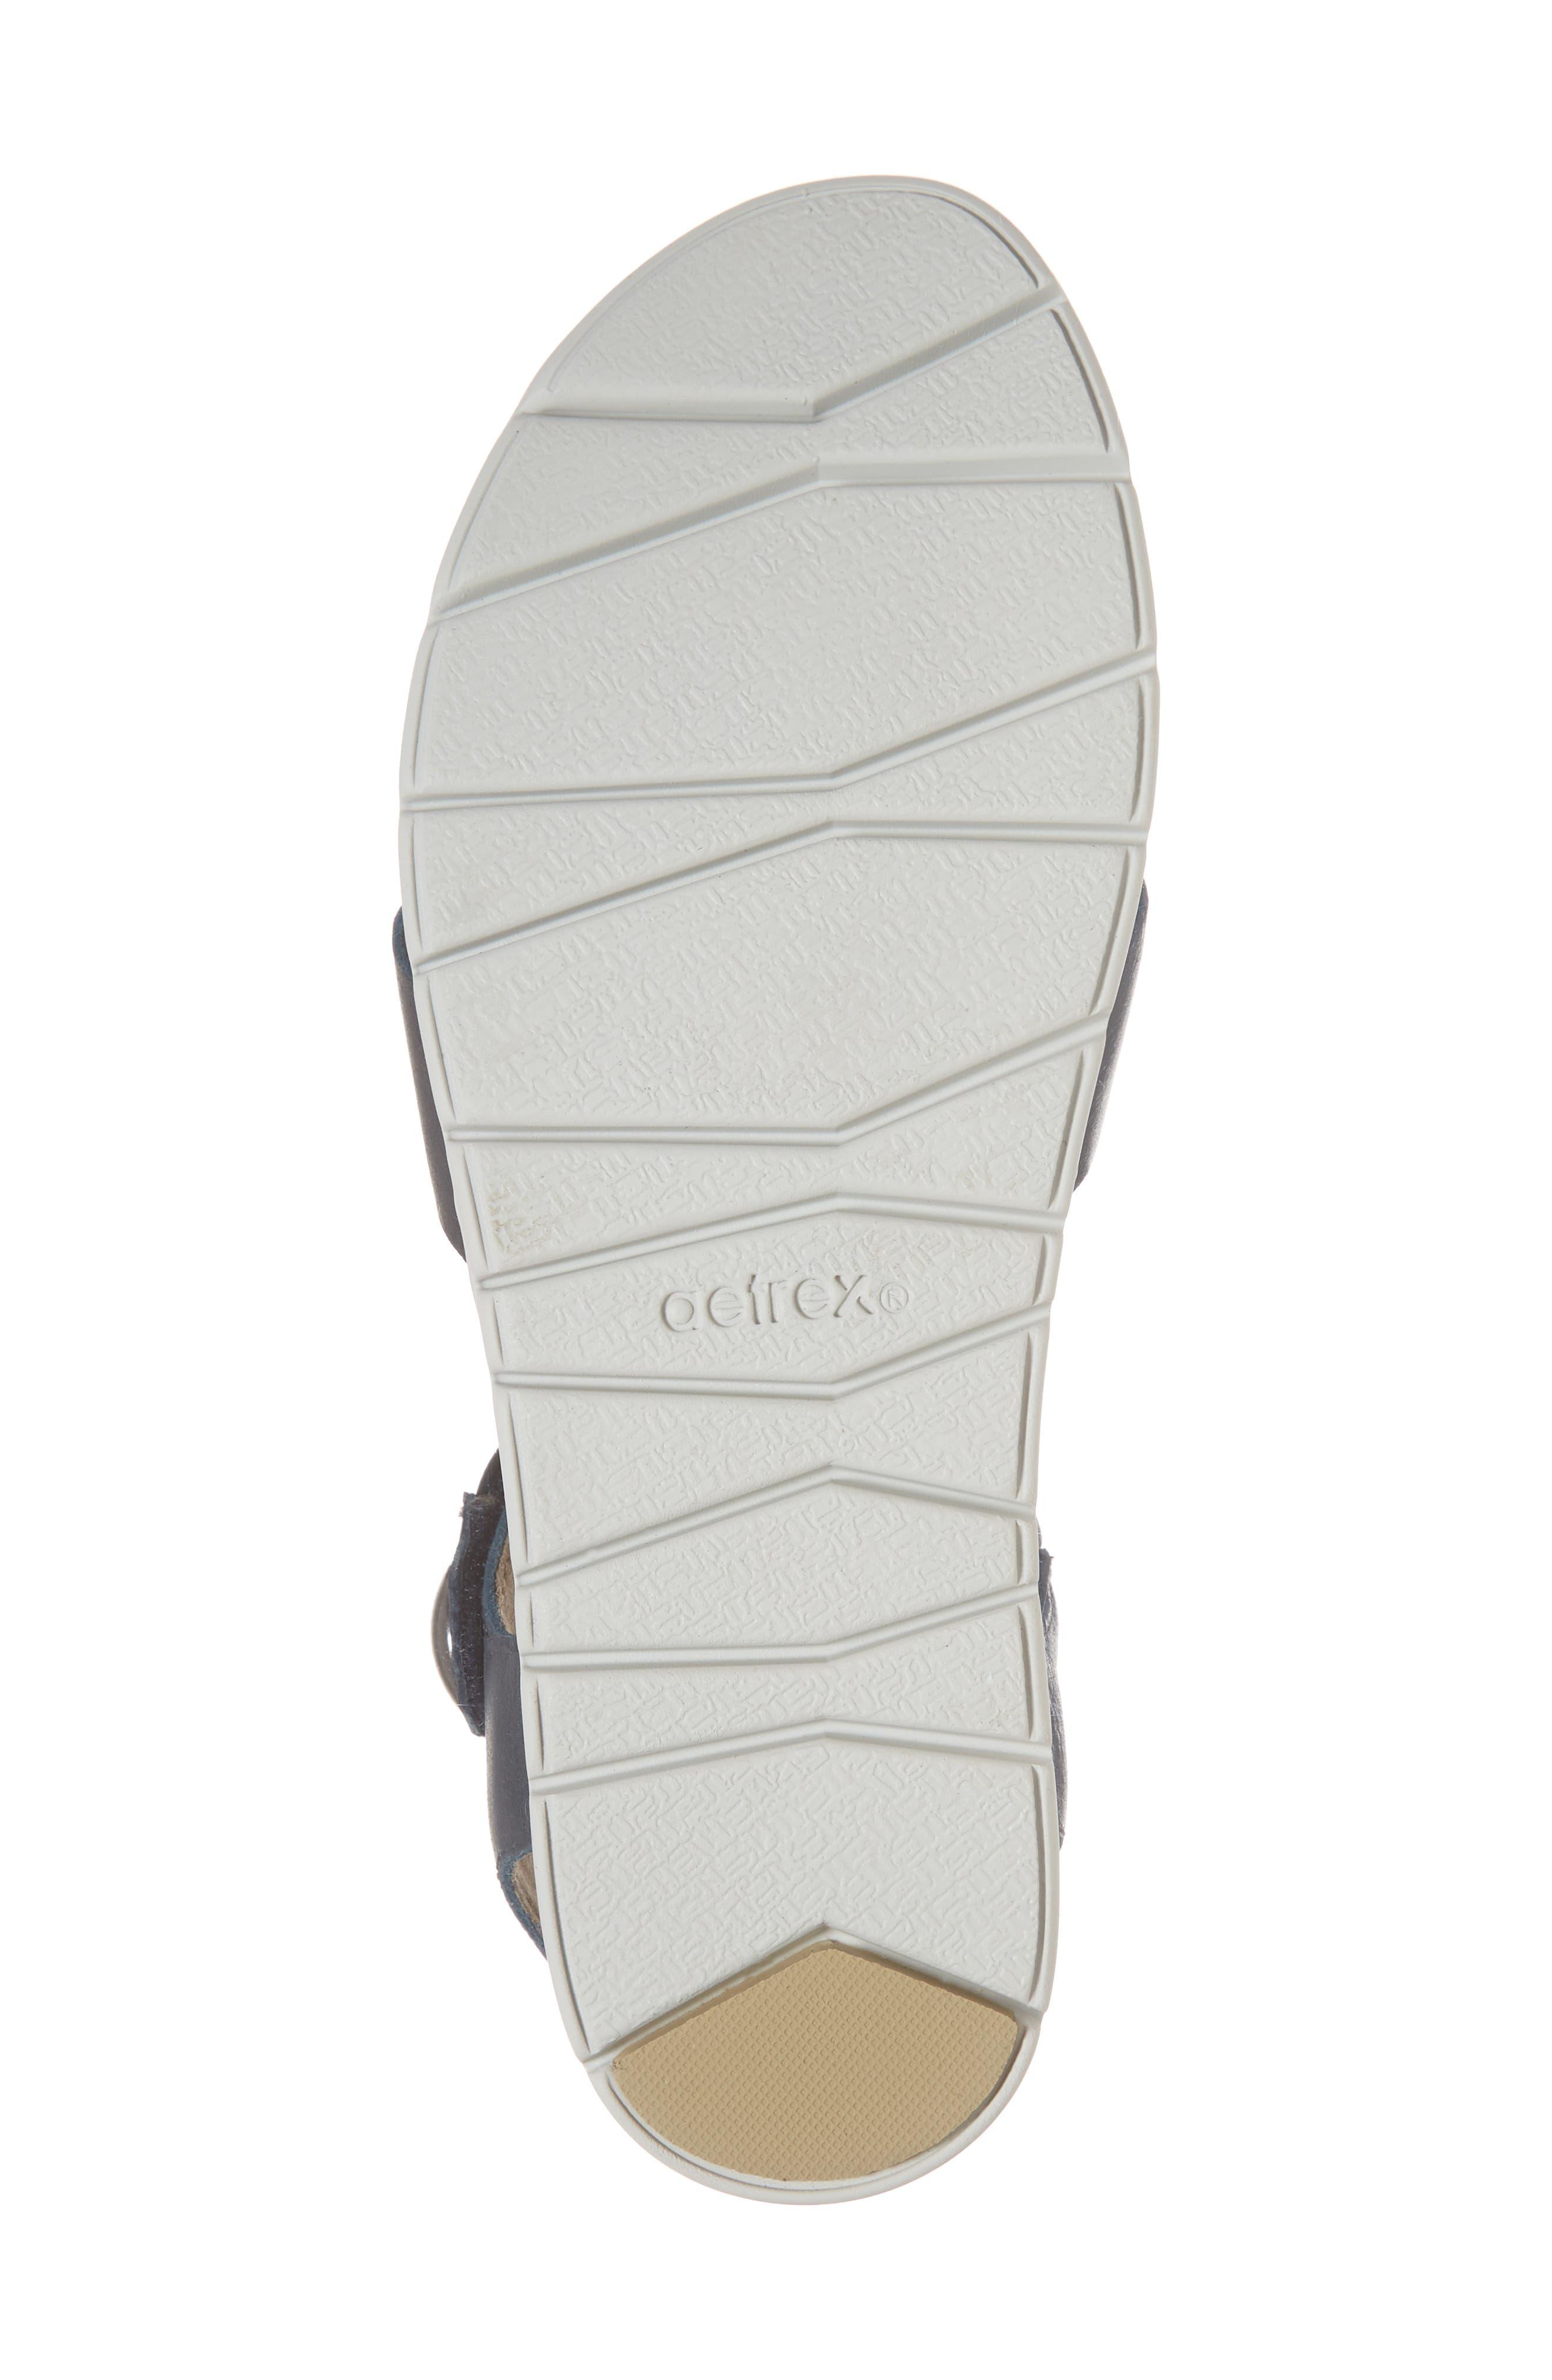 Piper Sandal,                             Alternate thumbnail 6, color,                             Navy Leather